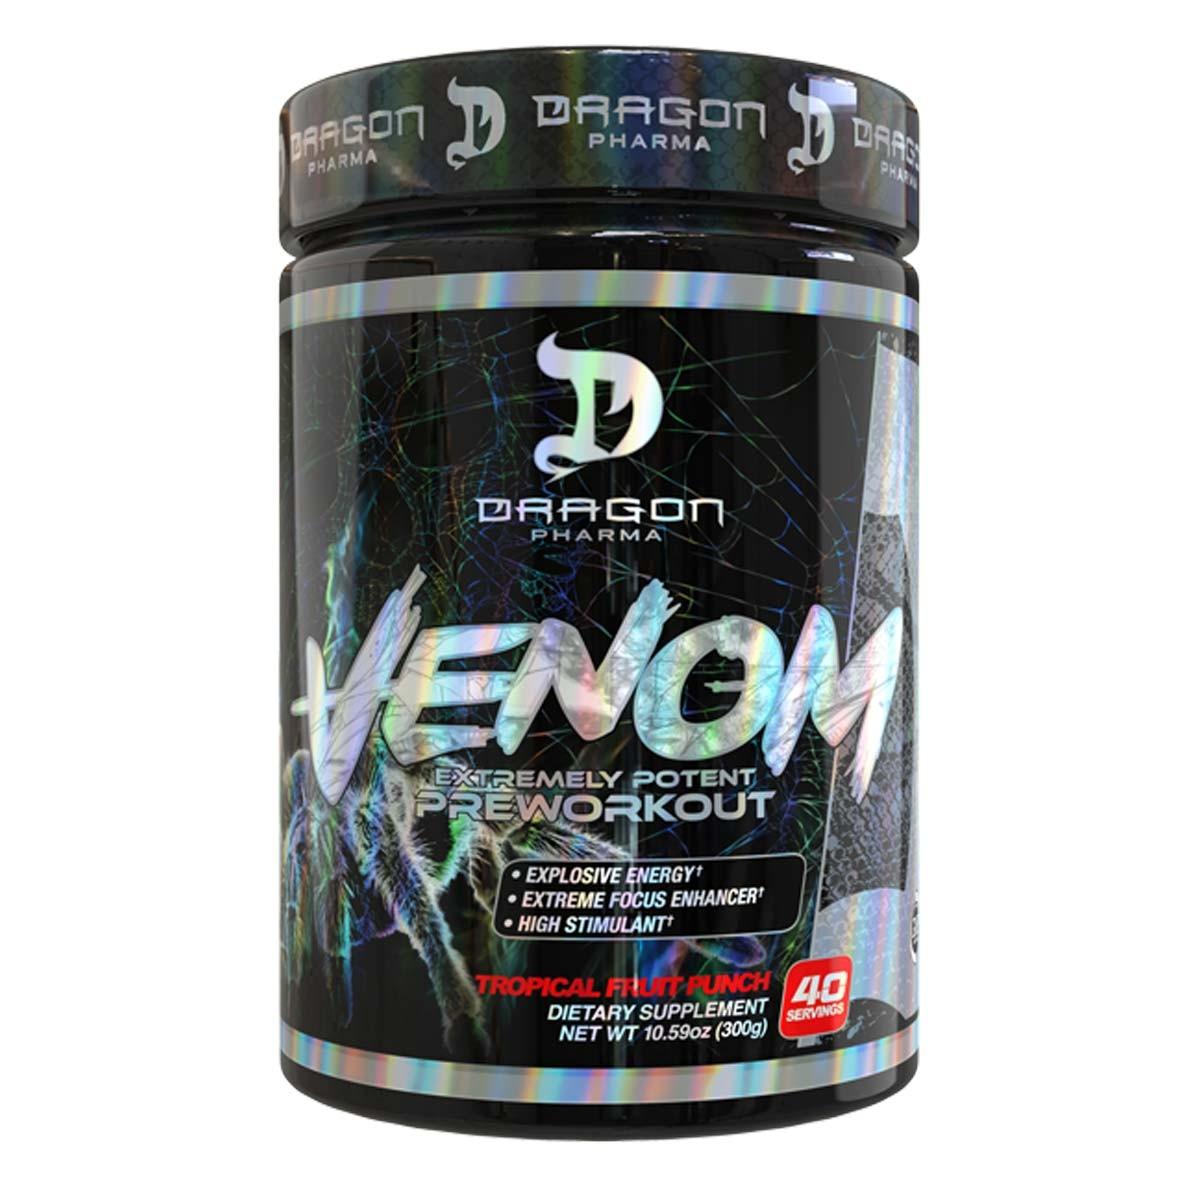 Foto 1 - Venom (40 Doses) - Pre-Treino Ultra Concentrado - Dragon Pharma